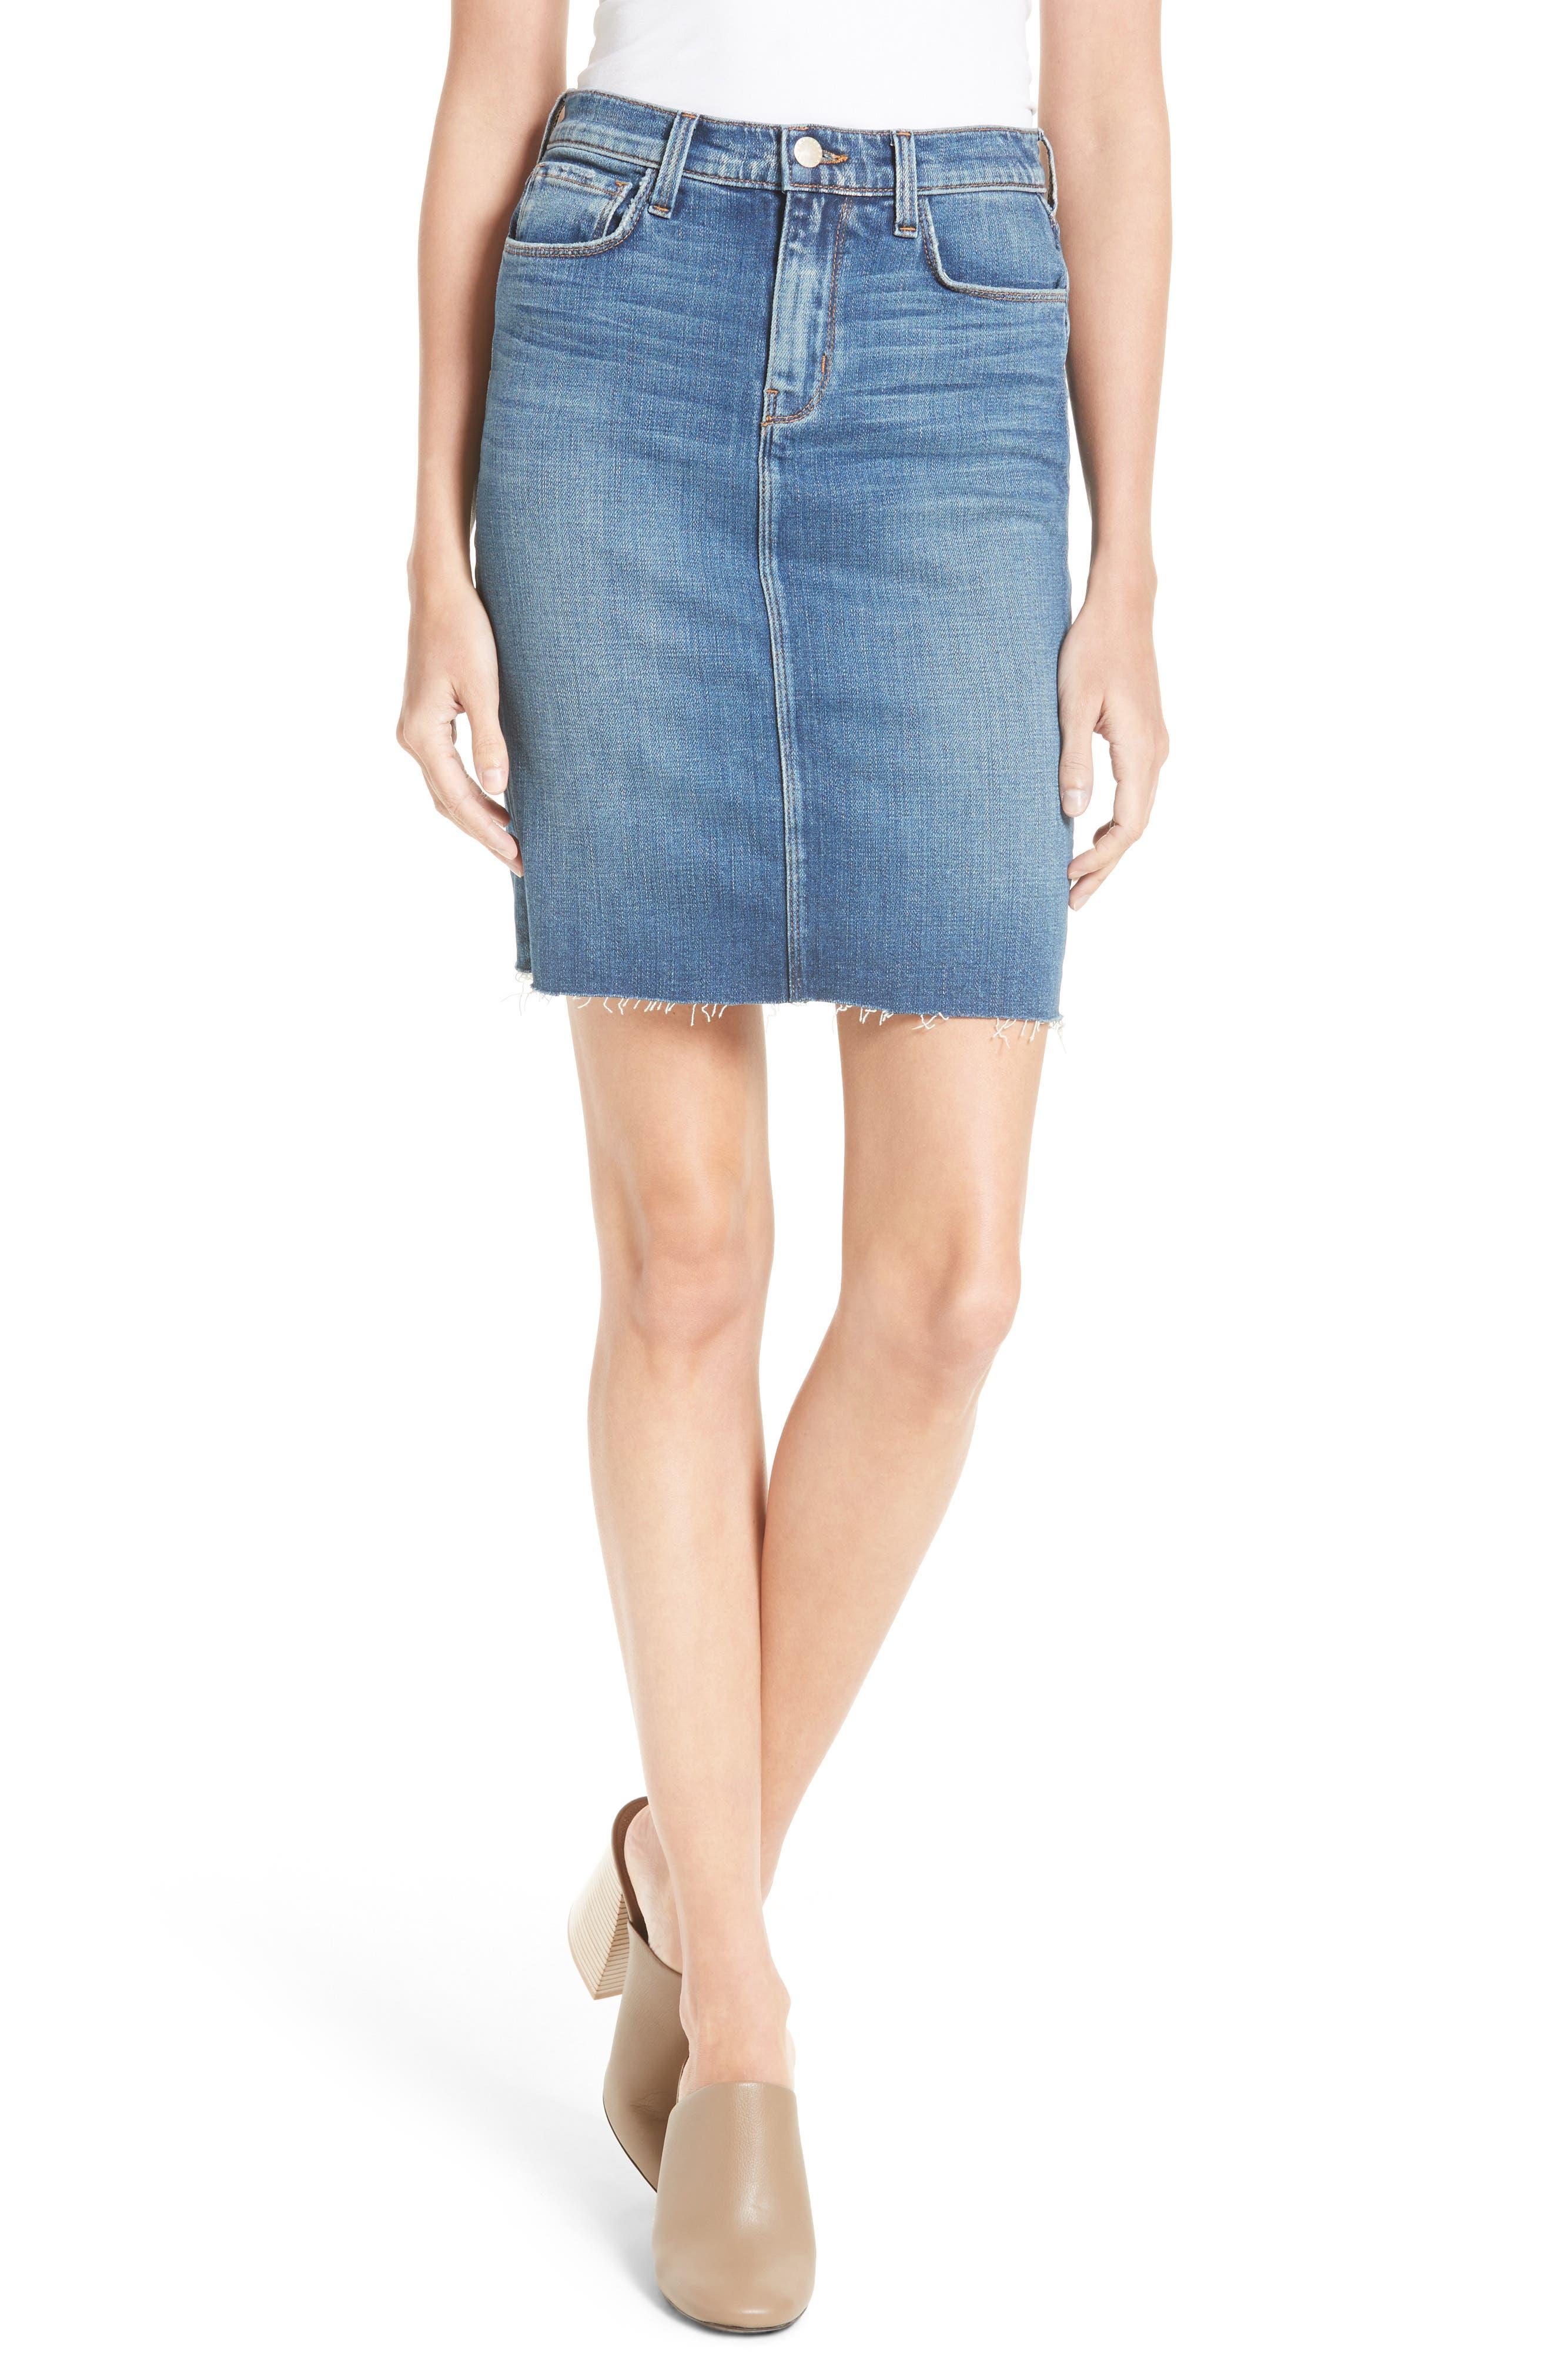 Montecito High Rise Denim Pencil Skirt,                         Main,                         color, Authentique